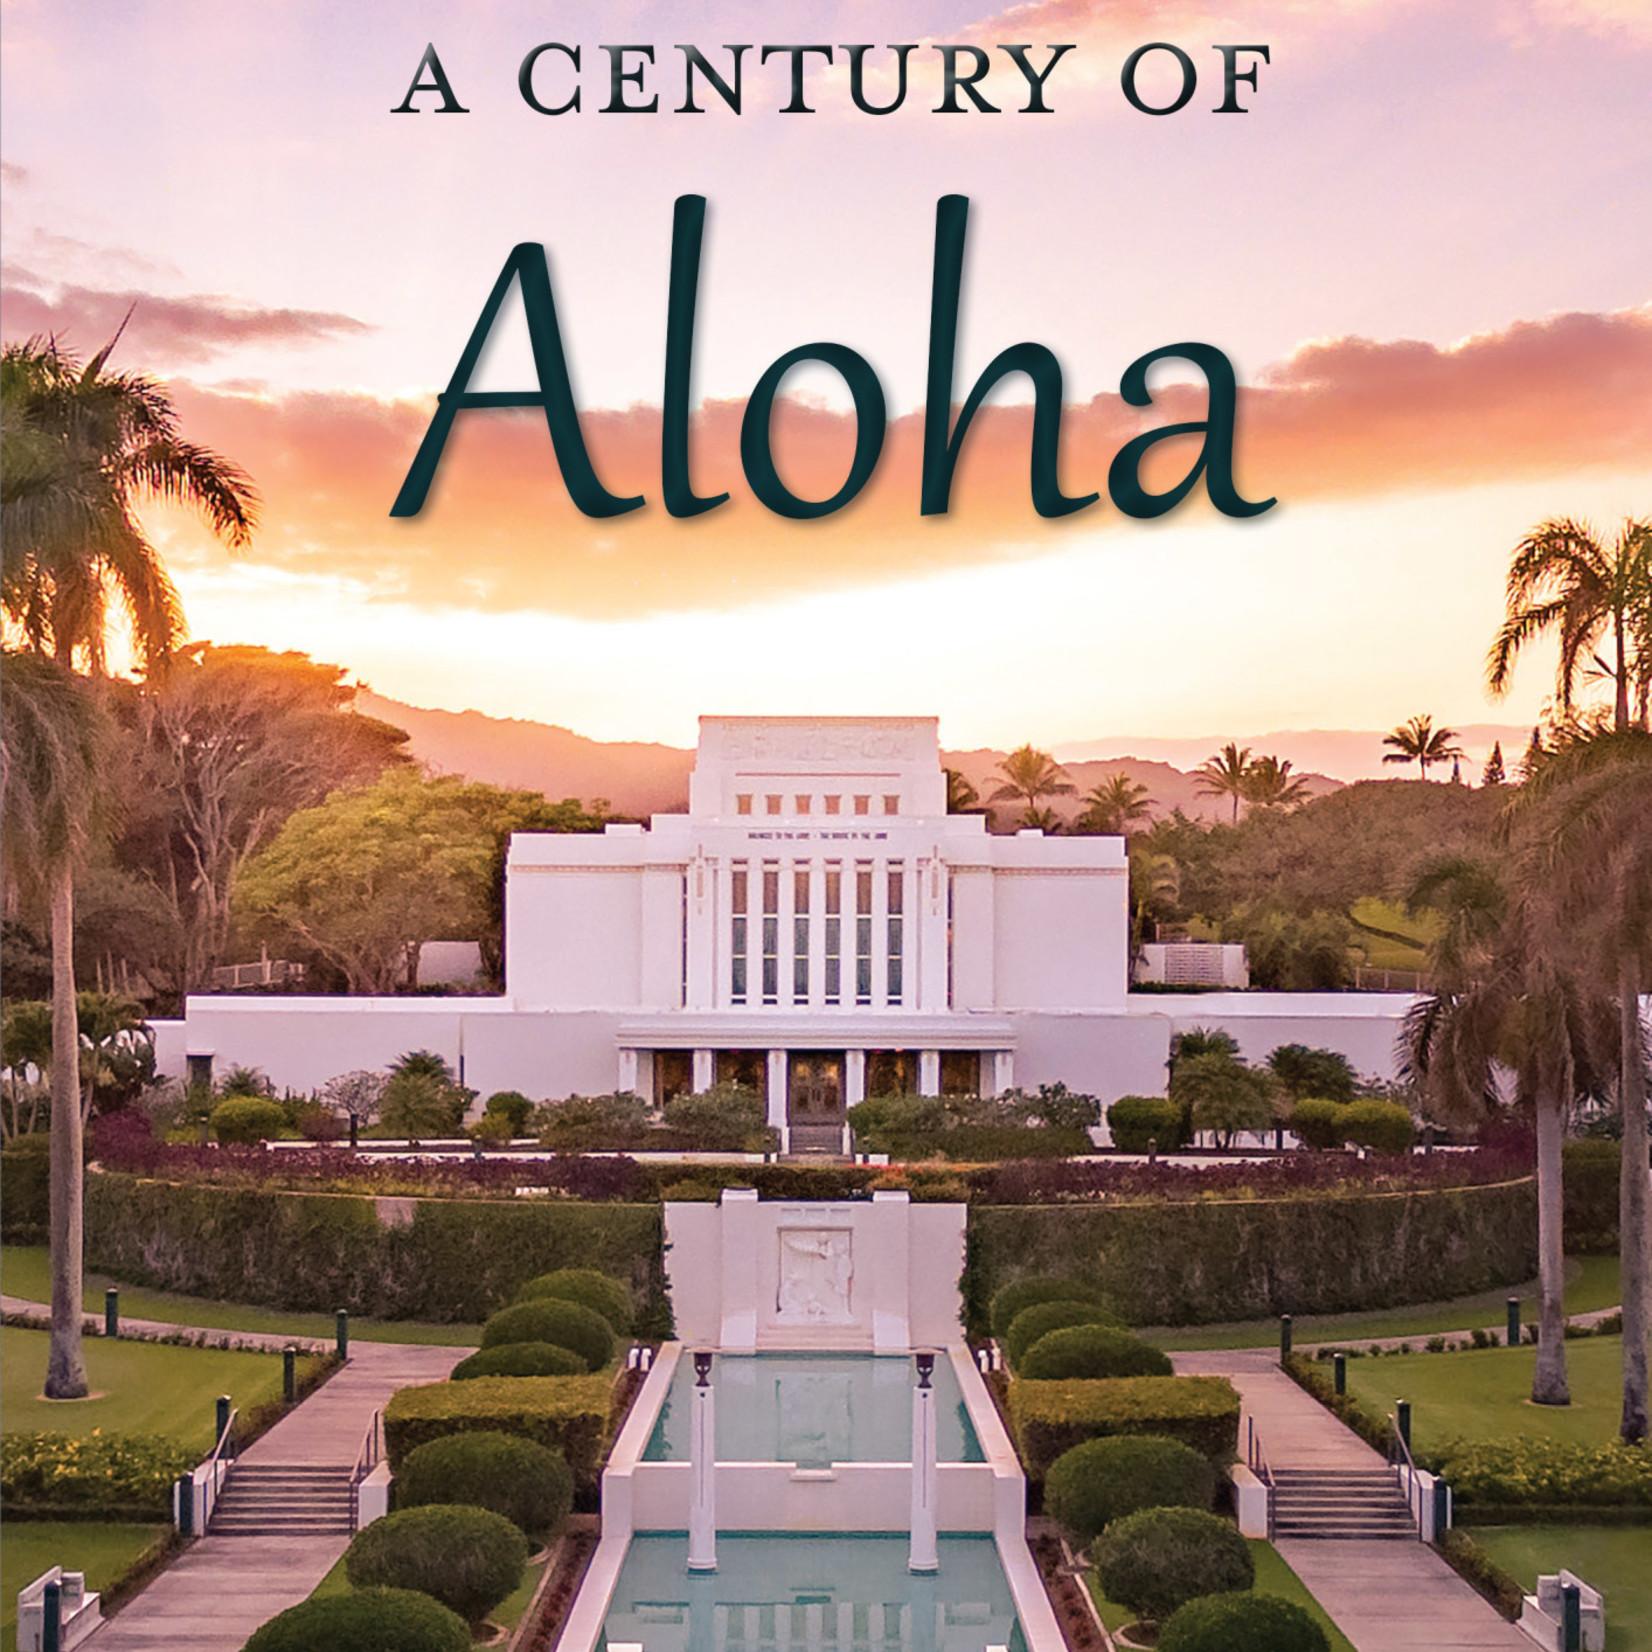 The Laie Hawaii Temple - A Century of Aloha